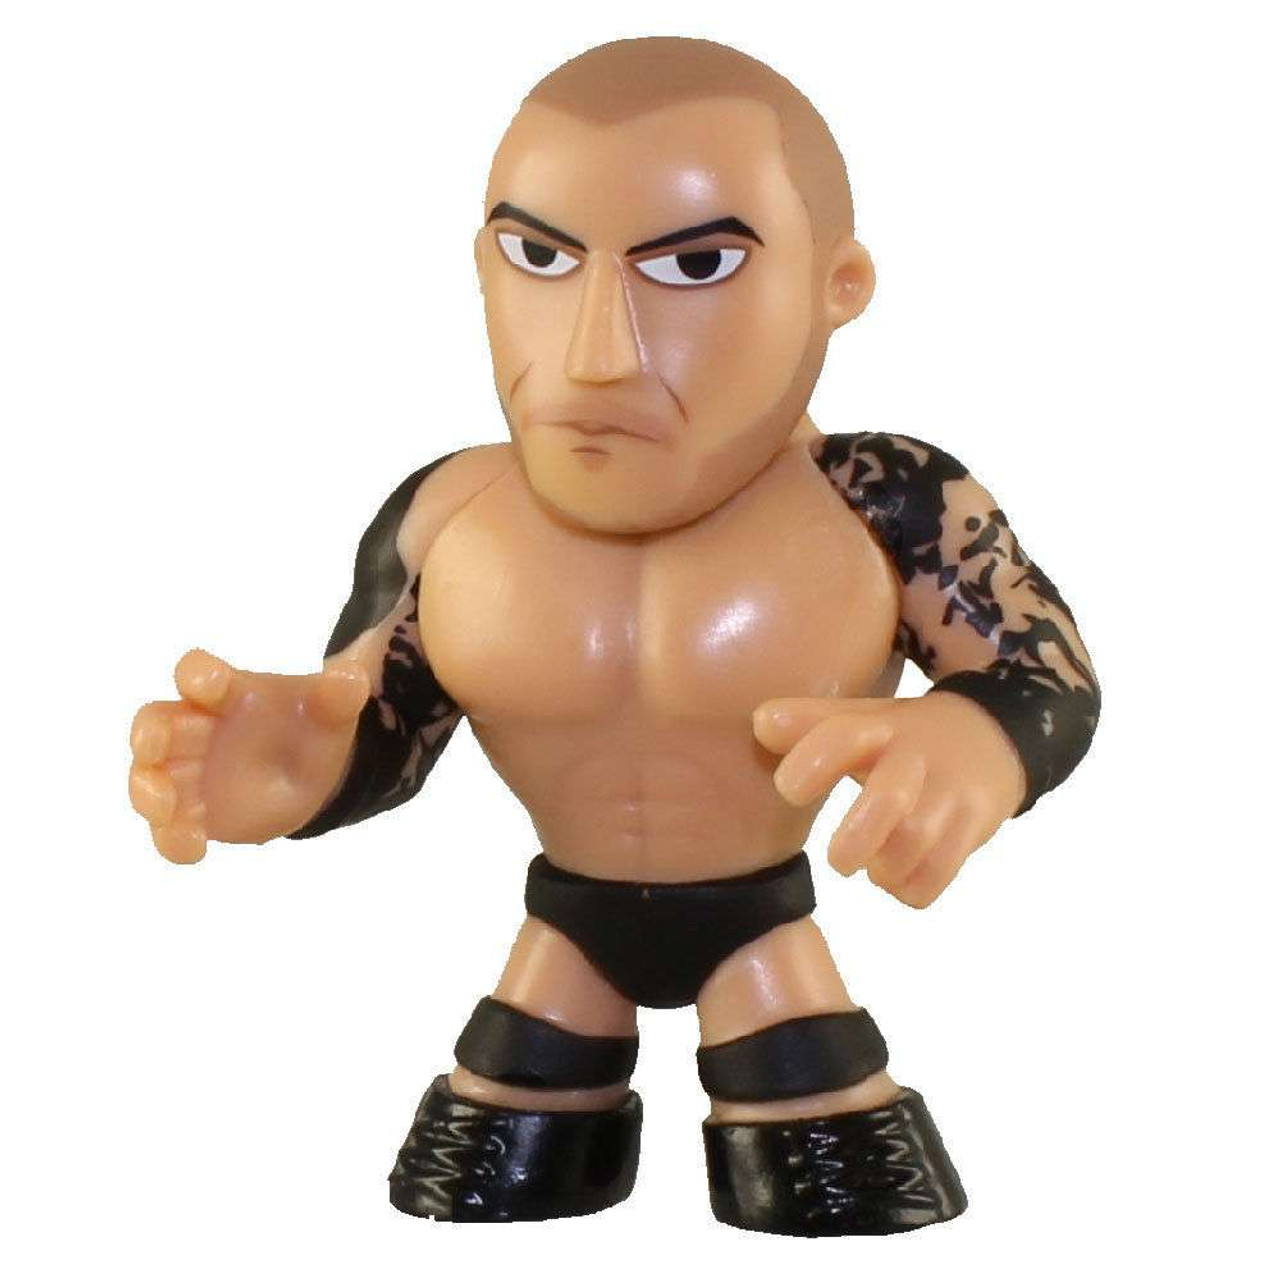 LOOSE Funko Mystery Minis Série WWE 2 Blind Box Bret Hitman Hart Vinyl Figure